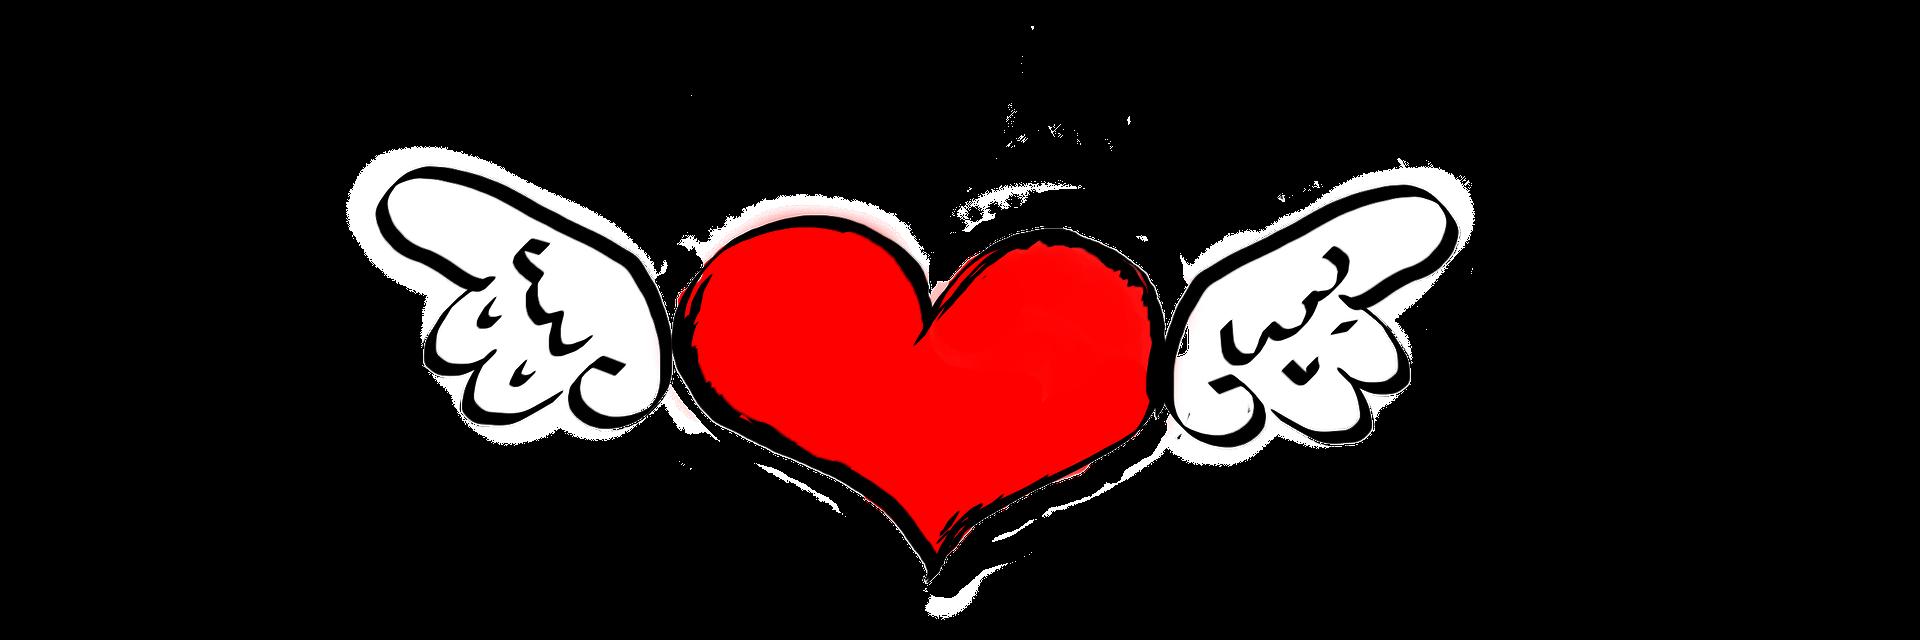 heart-2862408_1920